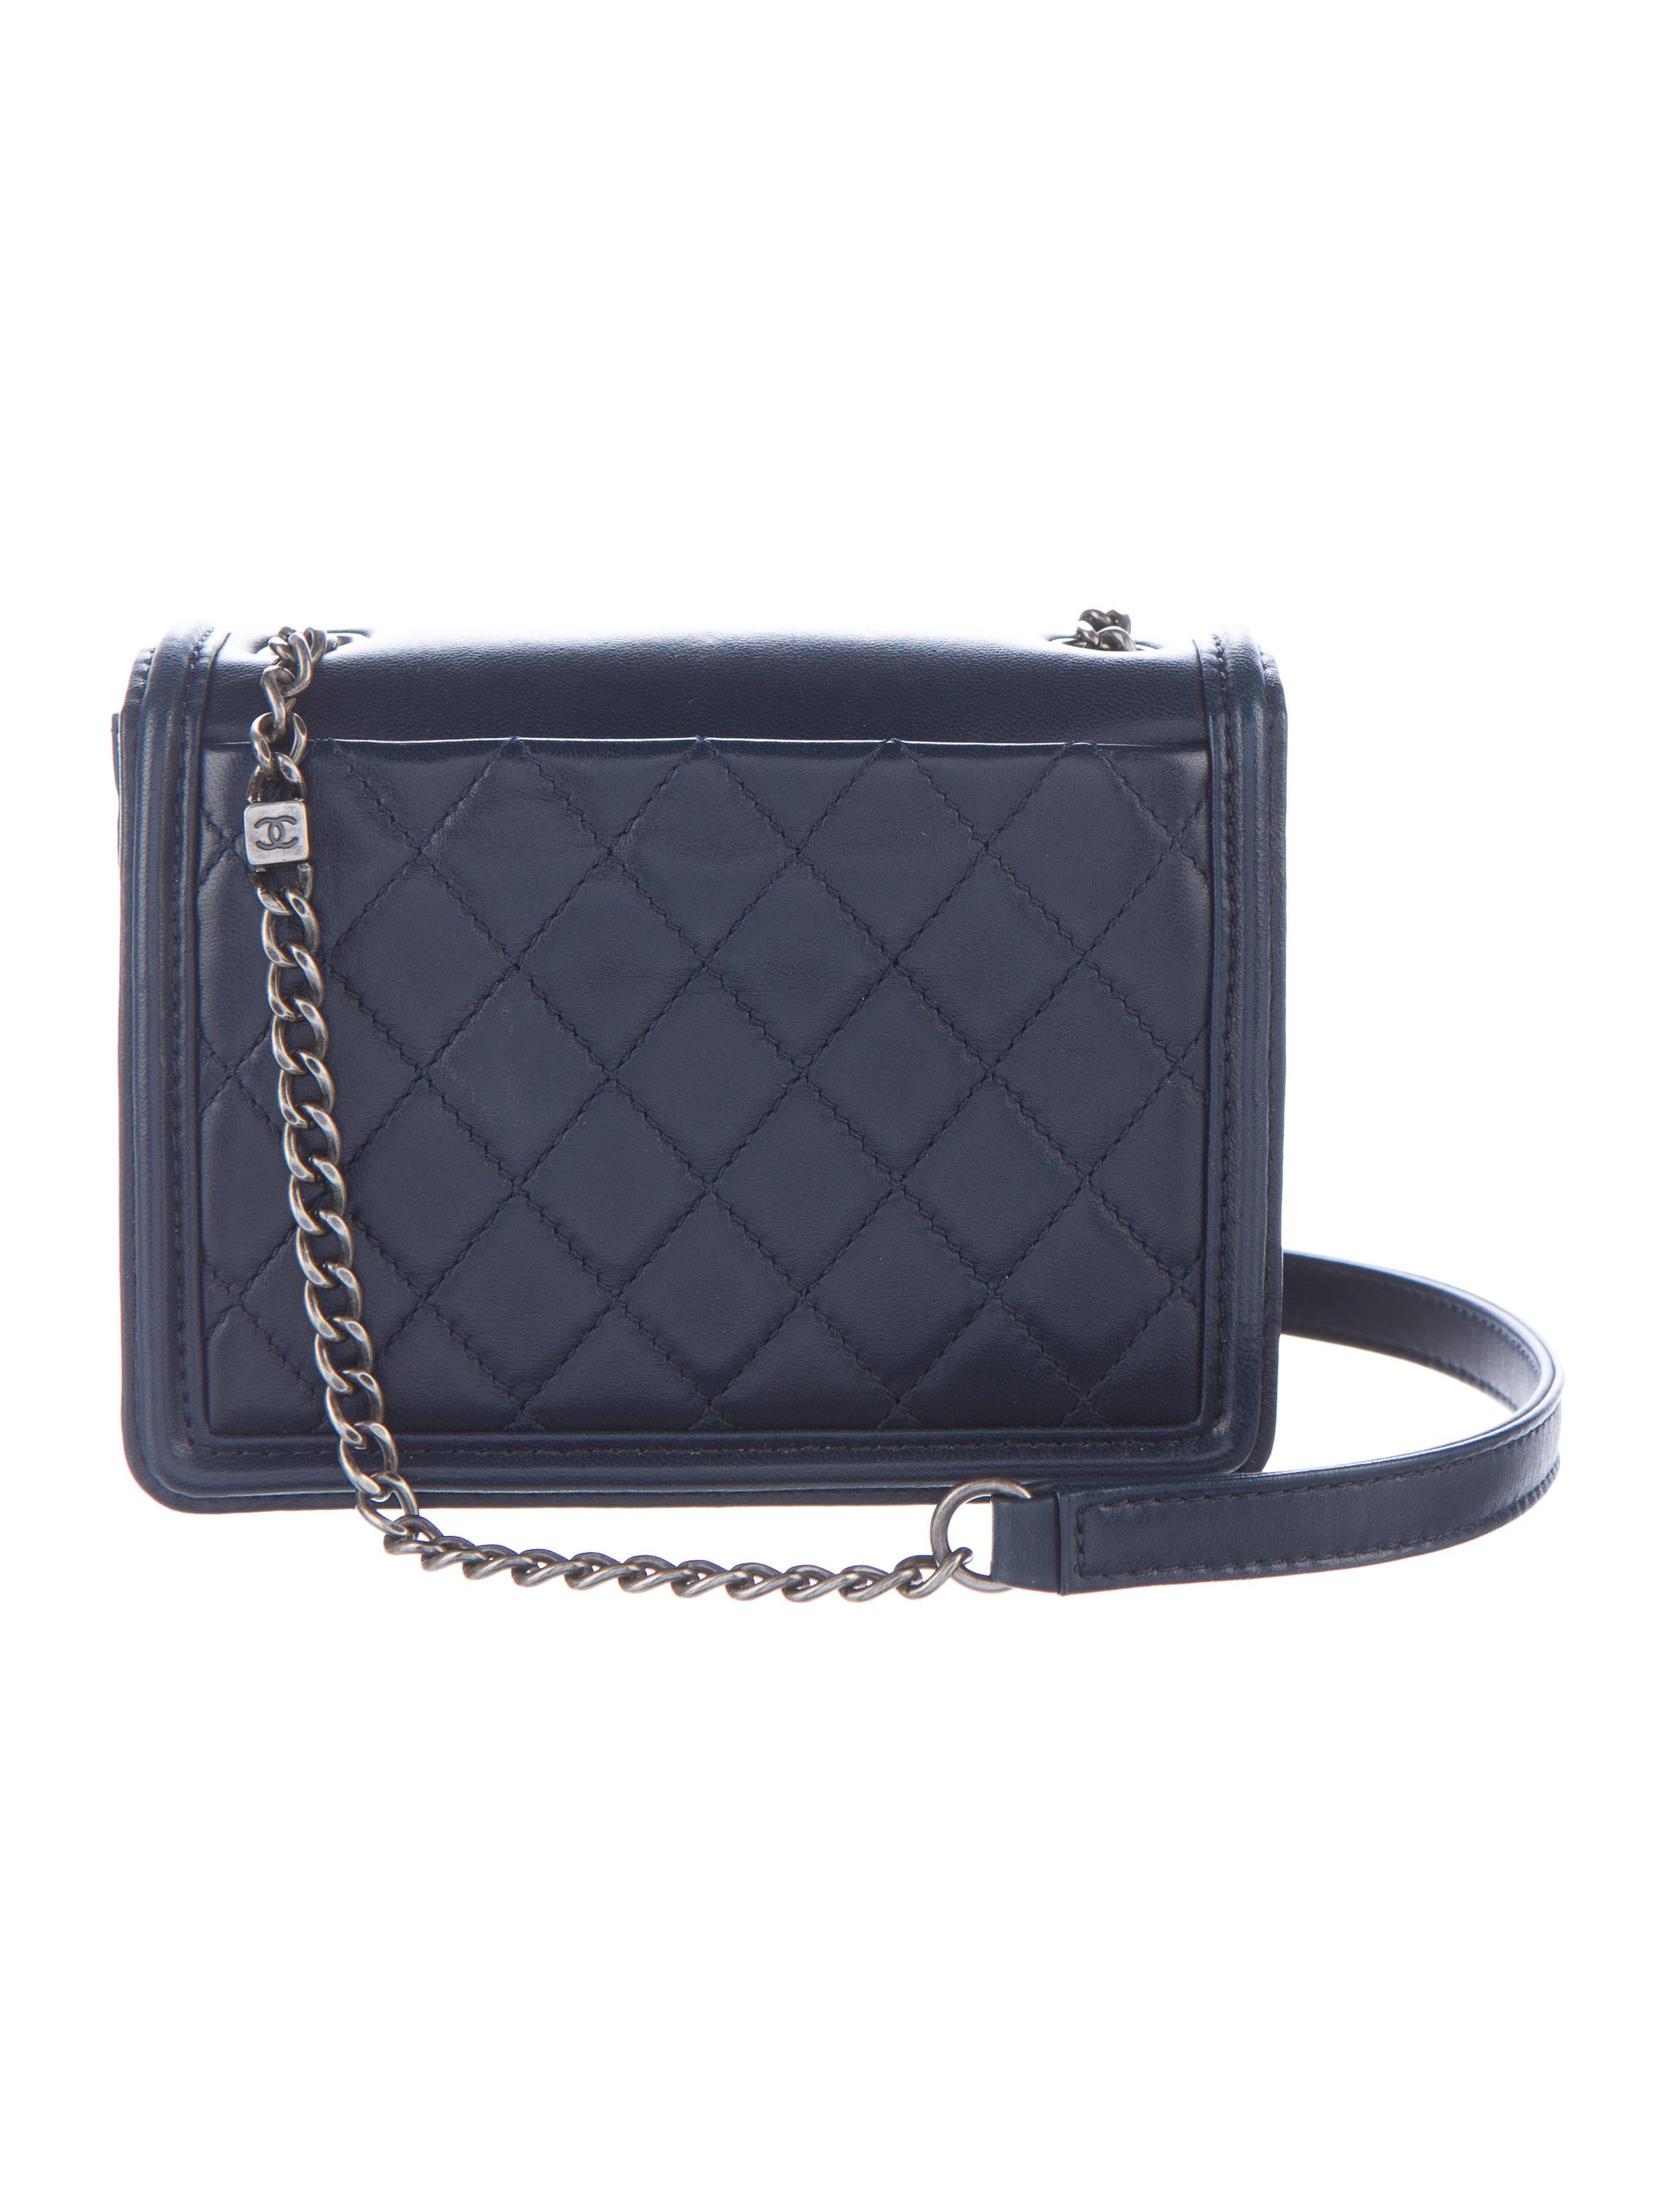 Chanel Boy Brick Flap Bag Handbags Cha162894 The